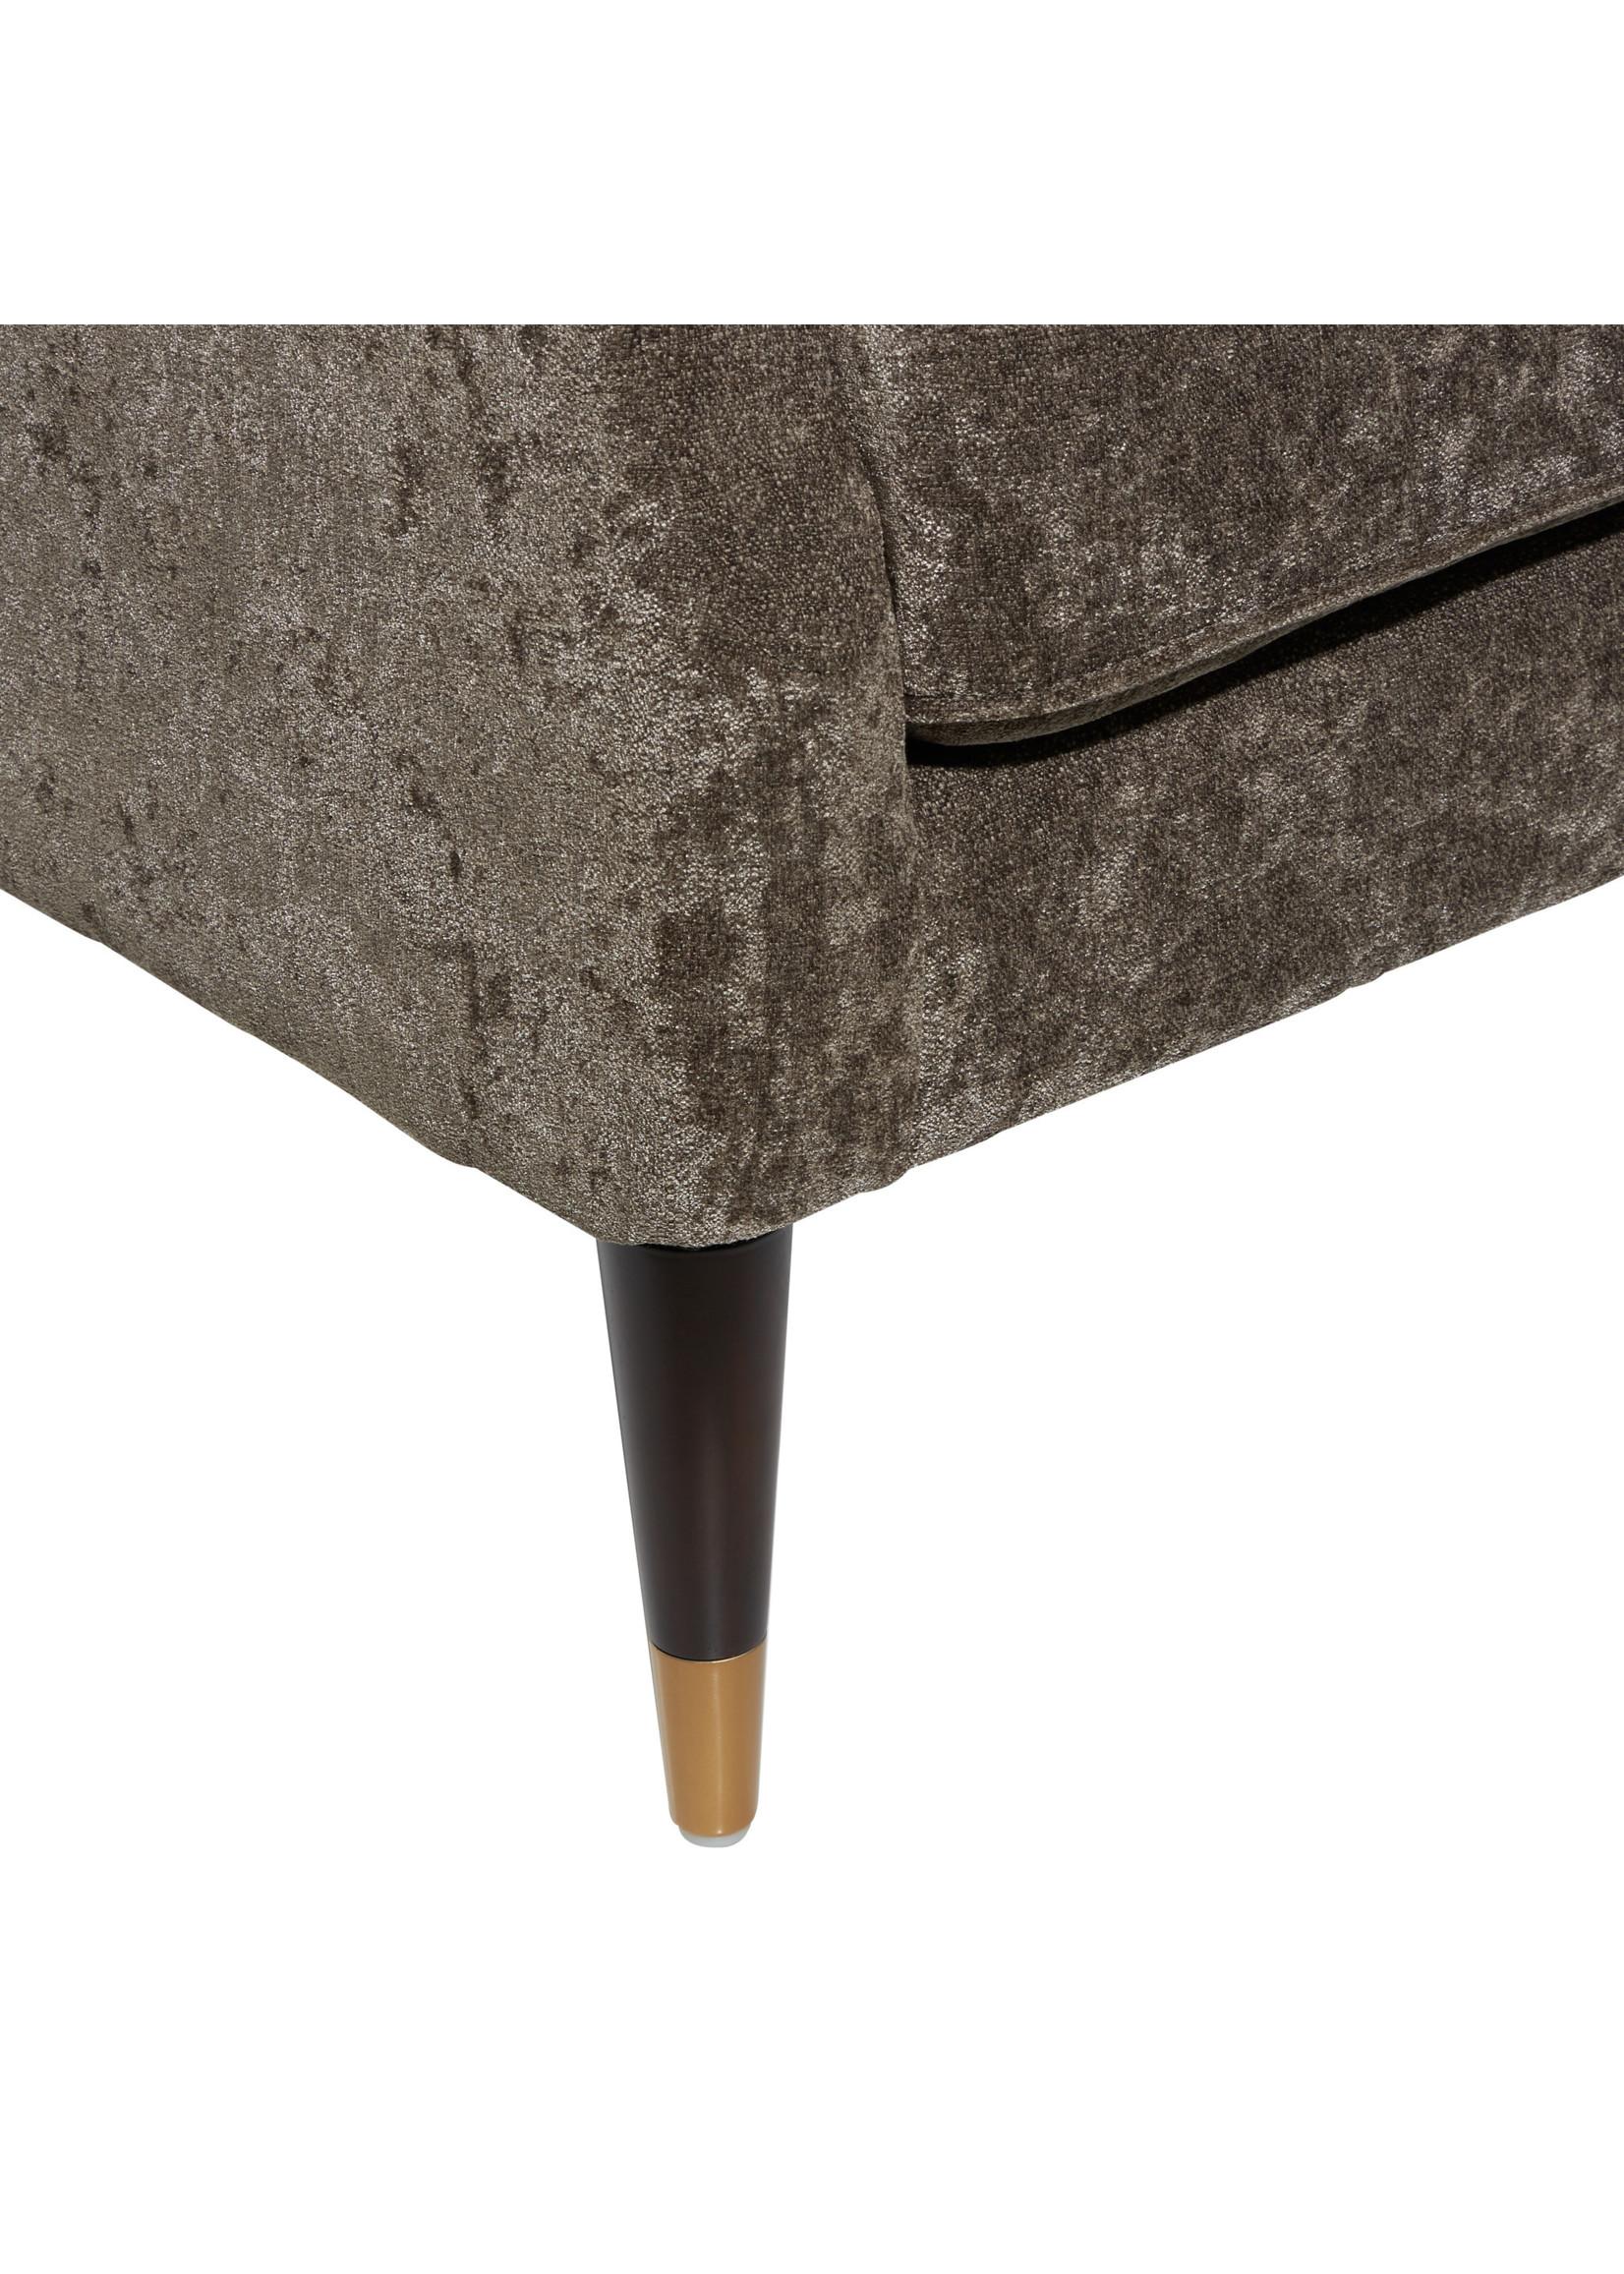 UMA Enterprises Accent Chair - Tufted Fabric Brown